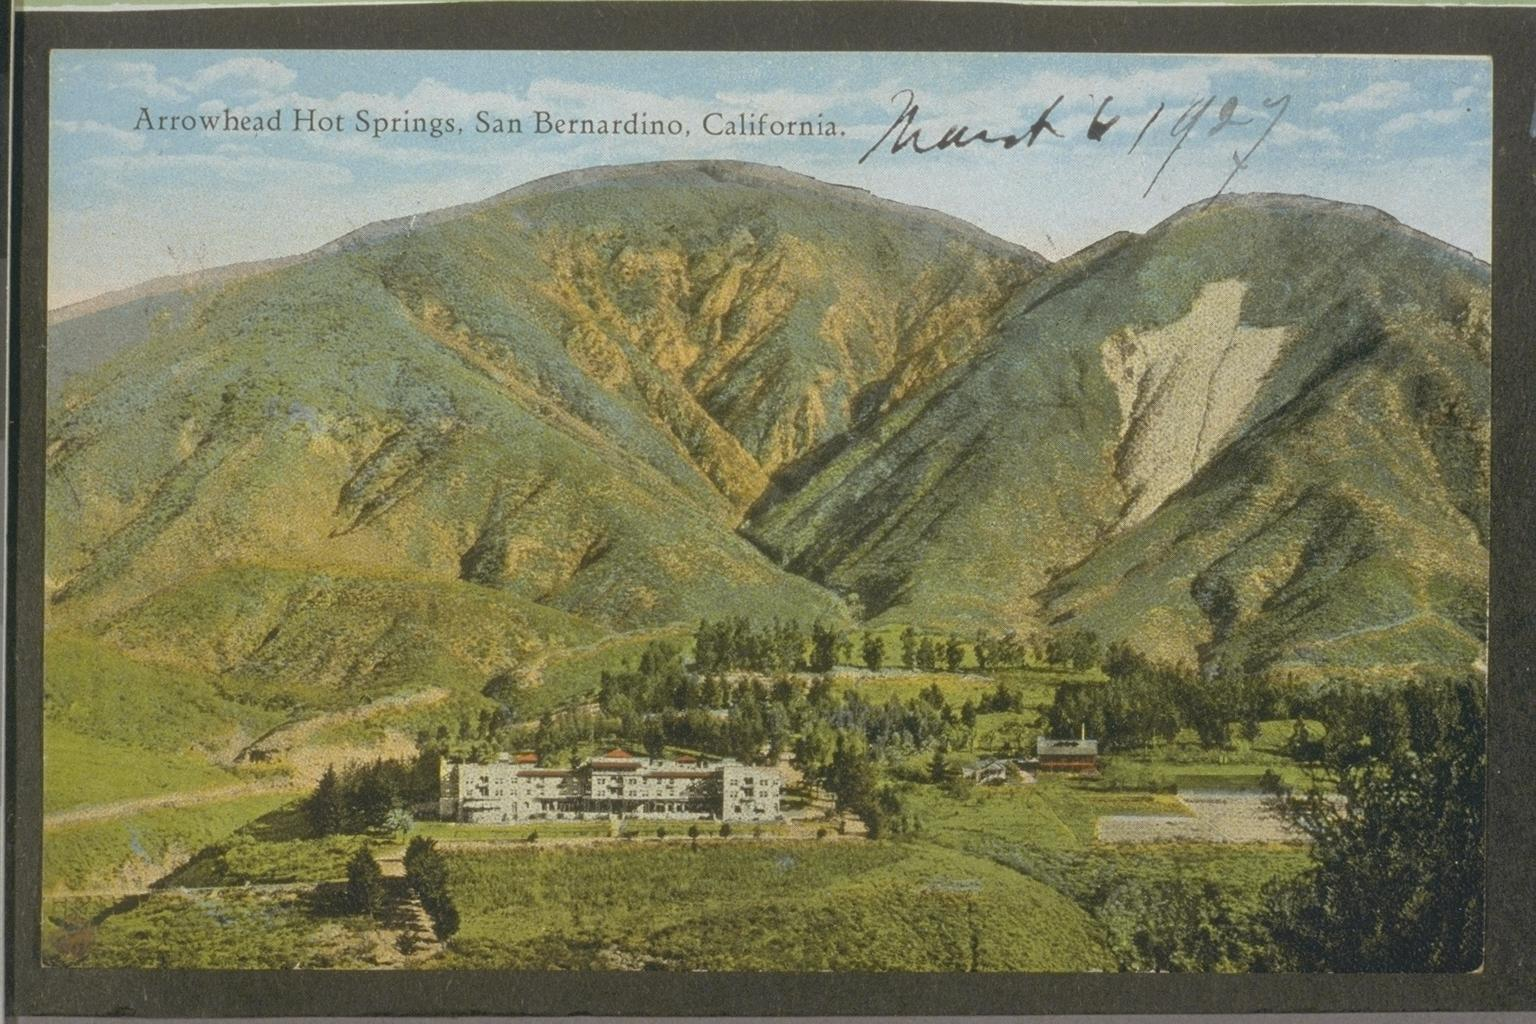 Arrowhead Mountain Spring Water: Arrowhead 100% Mountain